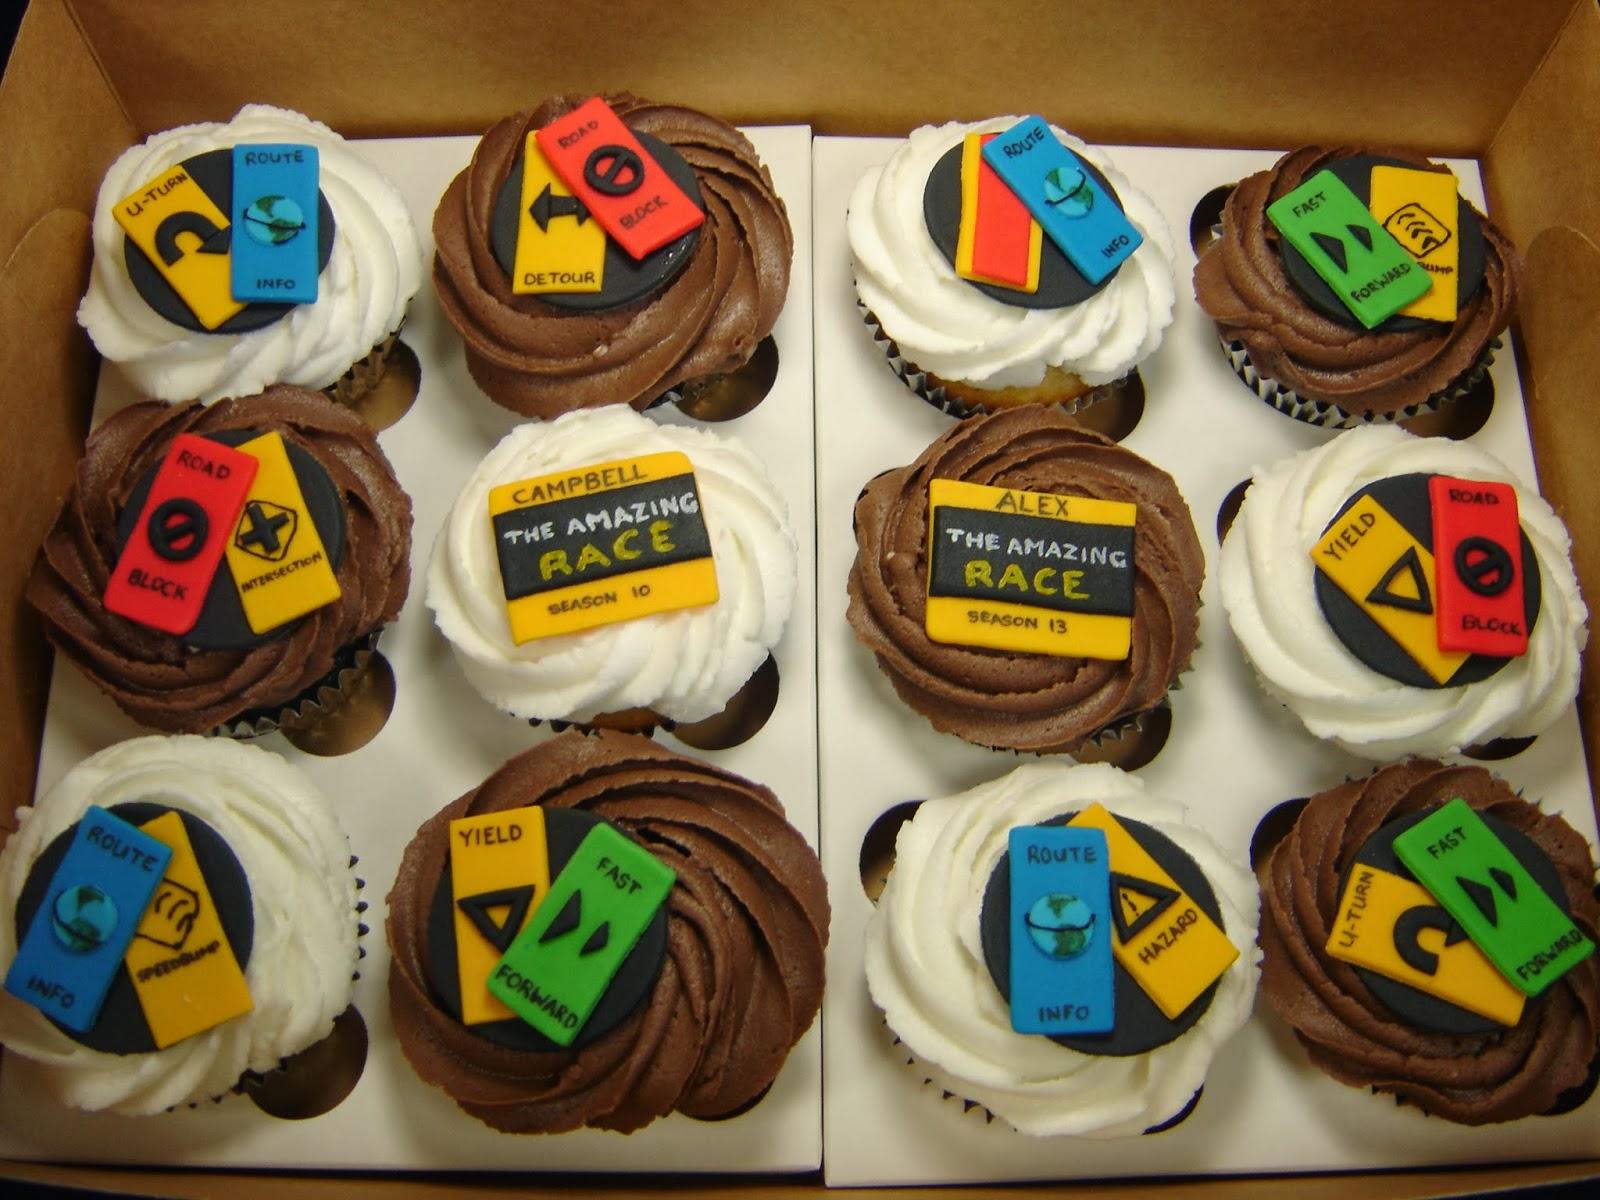 The Amazing Race Birthday Cake